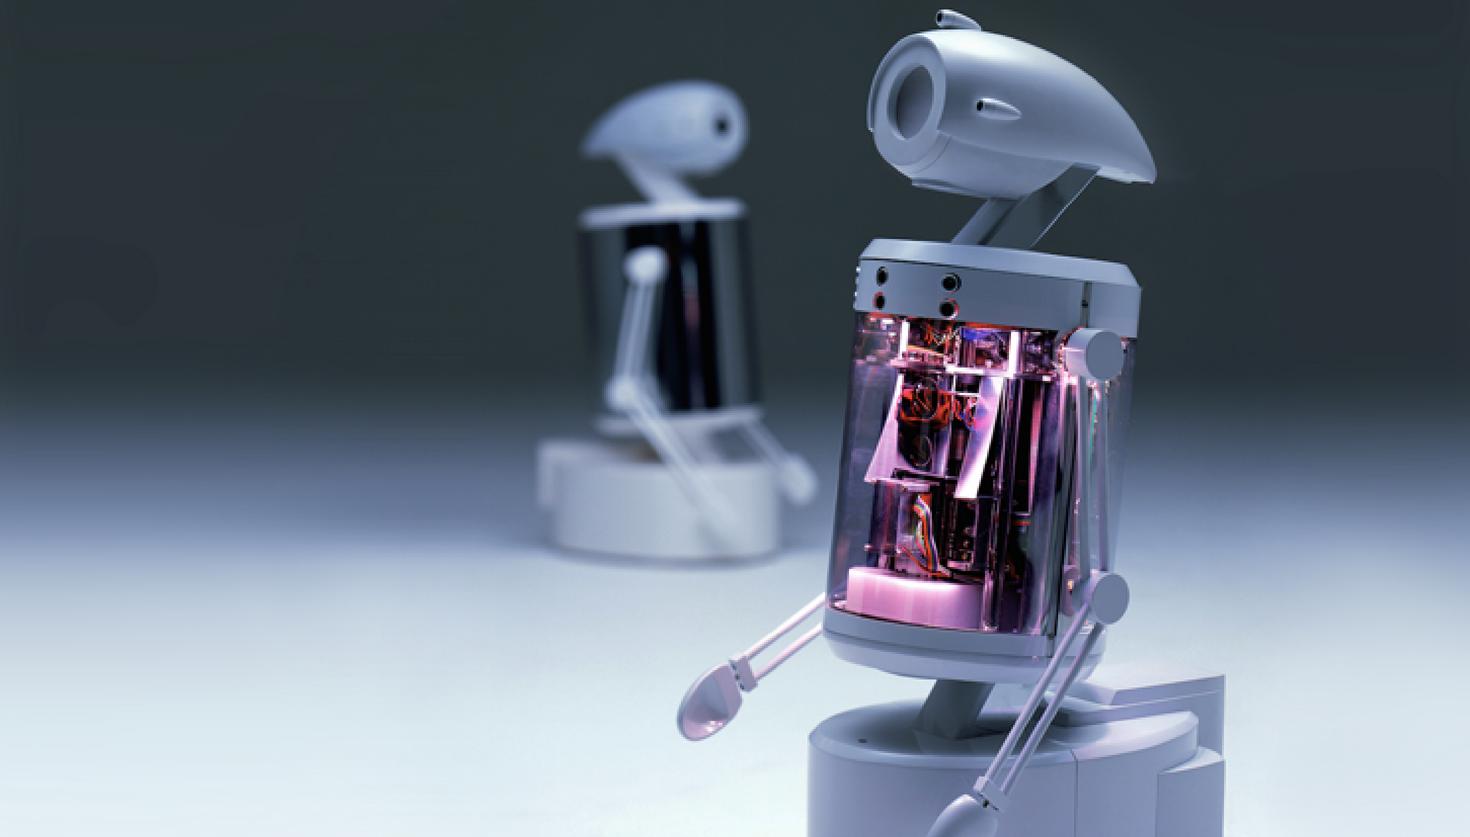 【Sneak Preview】  「ロボットがいる日常」をデザインする